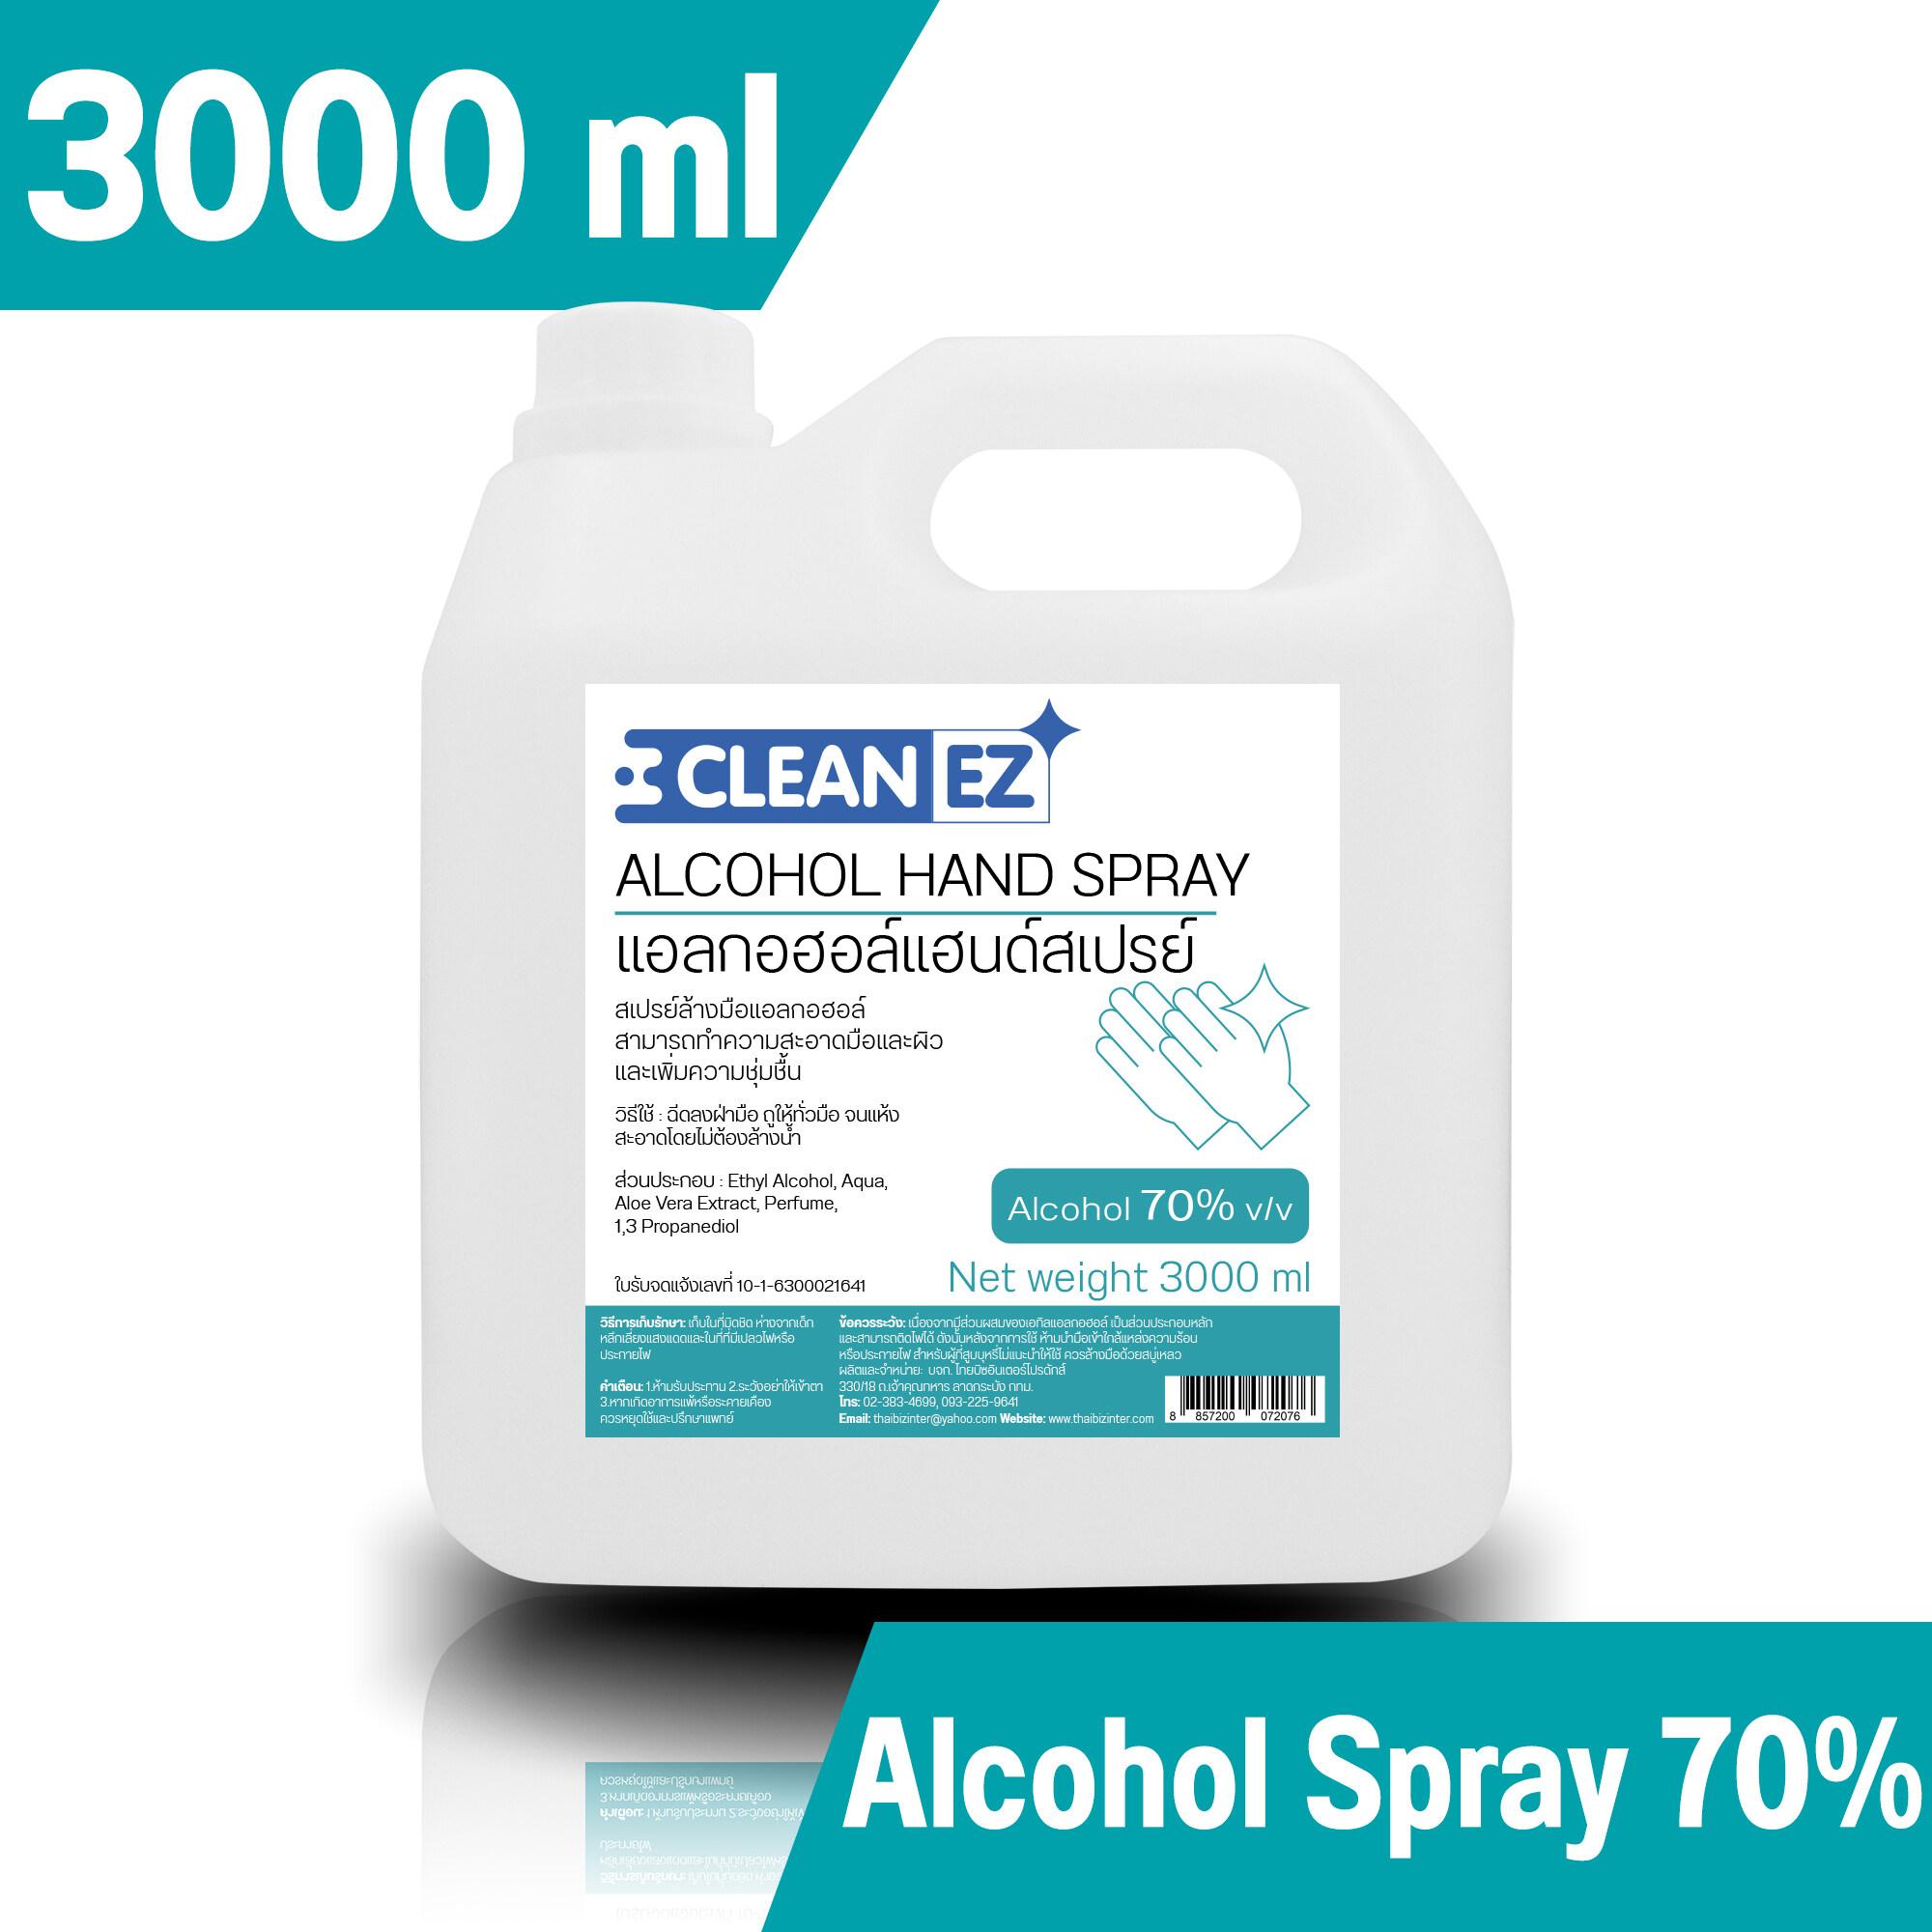 Clean Ez แอลกอฮอล์สเปรย์ 3000 มล. แอลกอฮอล์ 70% Alcohol Hand Spray 3000 Ml 3 ลิตร กำจัดเชื้อโรค แบคทีเรีย ไวรัส 99.99% ฆ่าเชื้อโรคได้ยาวนาน ทำความสะอาด.